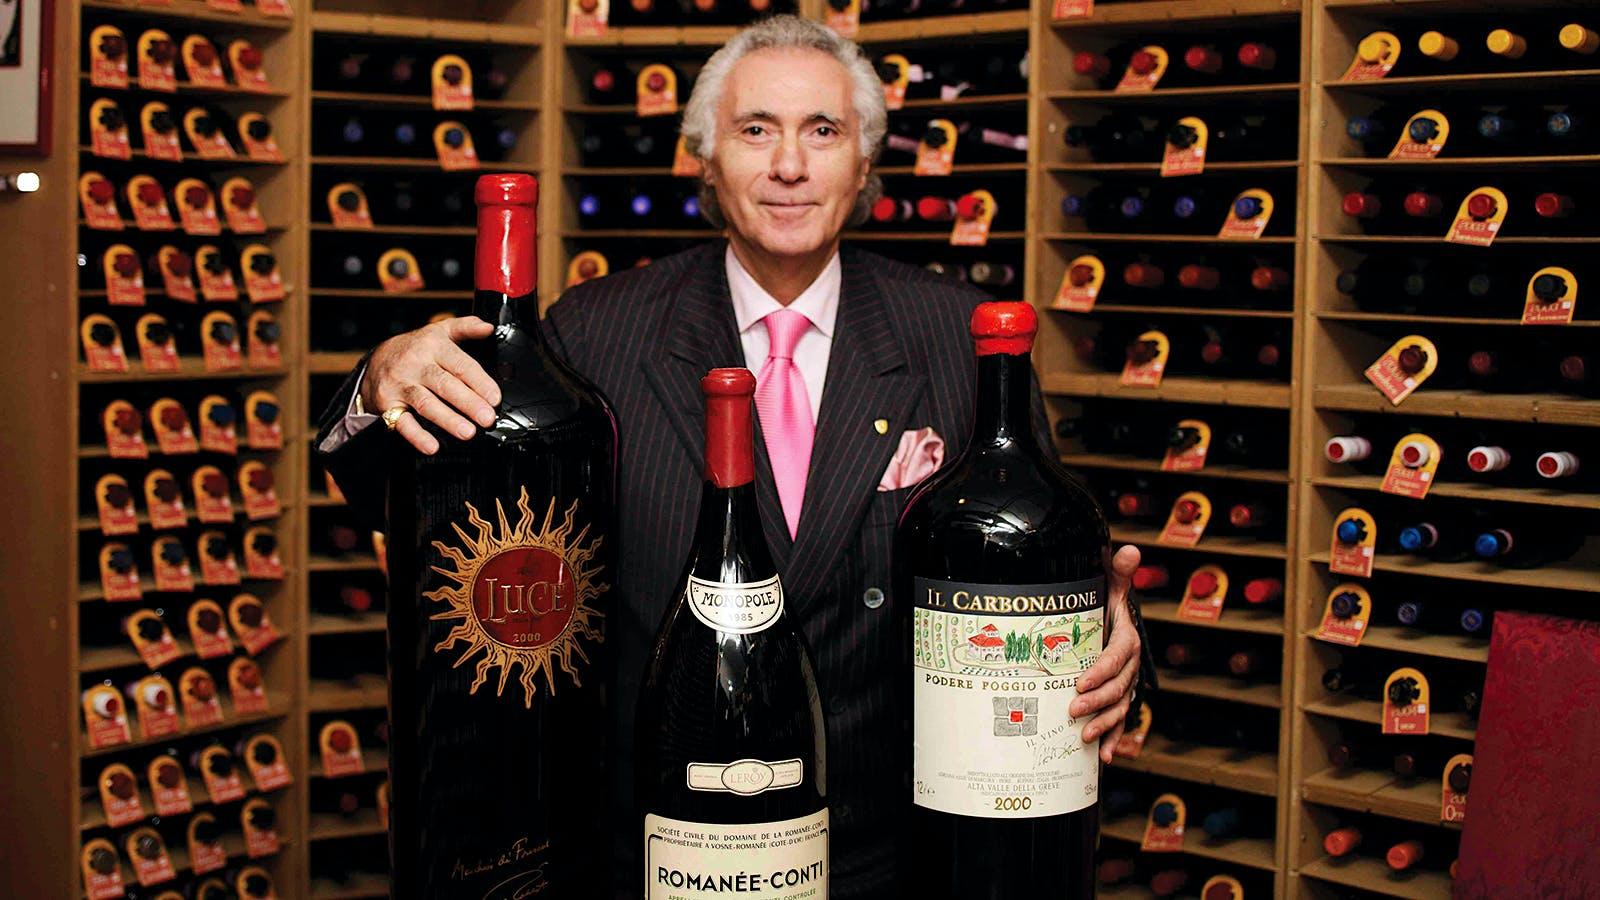 Zachys Auctions Rare Wines from Italy's Enoteca Pinchiorri